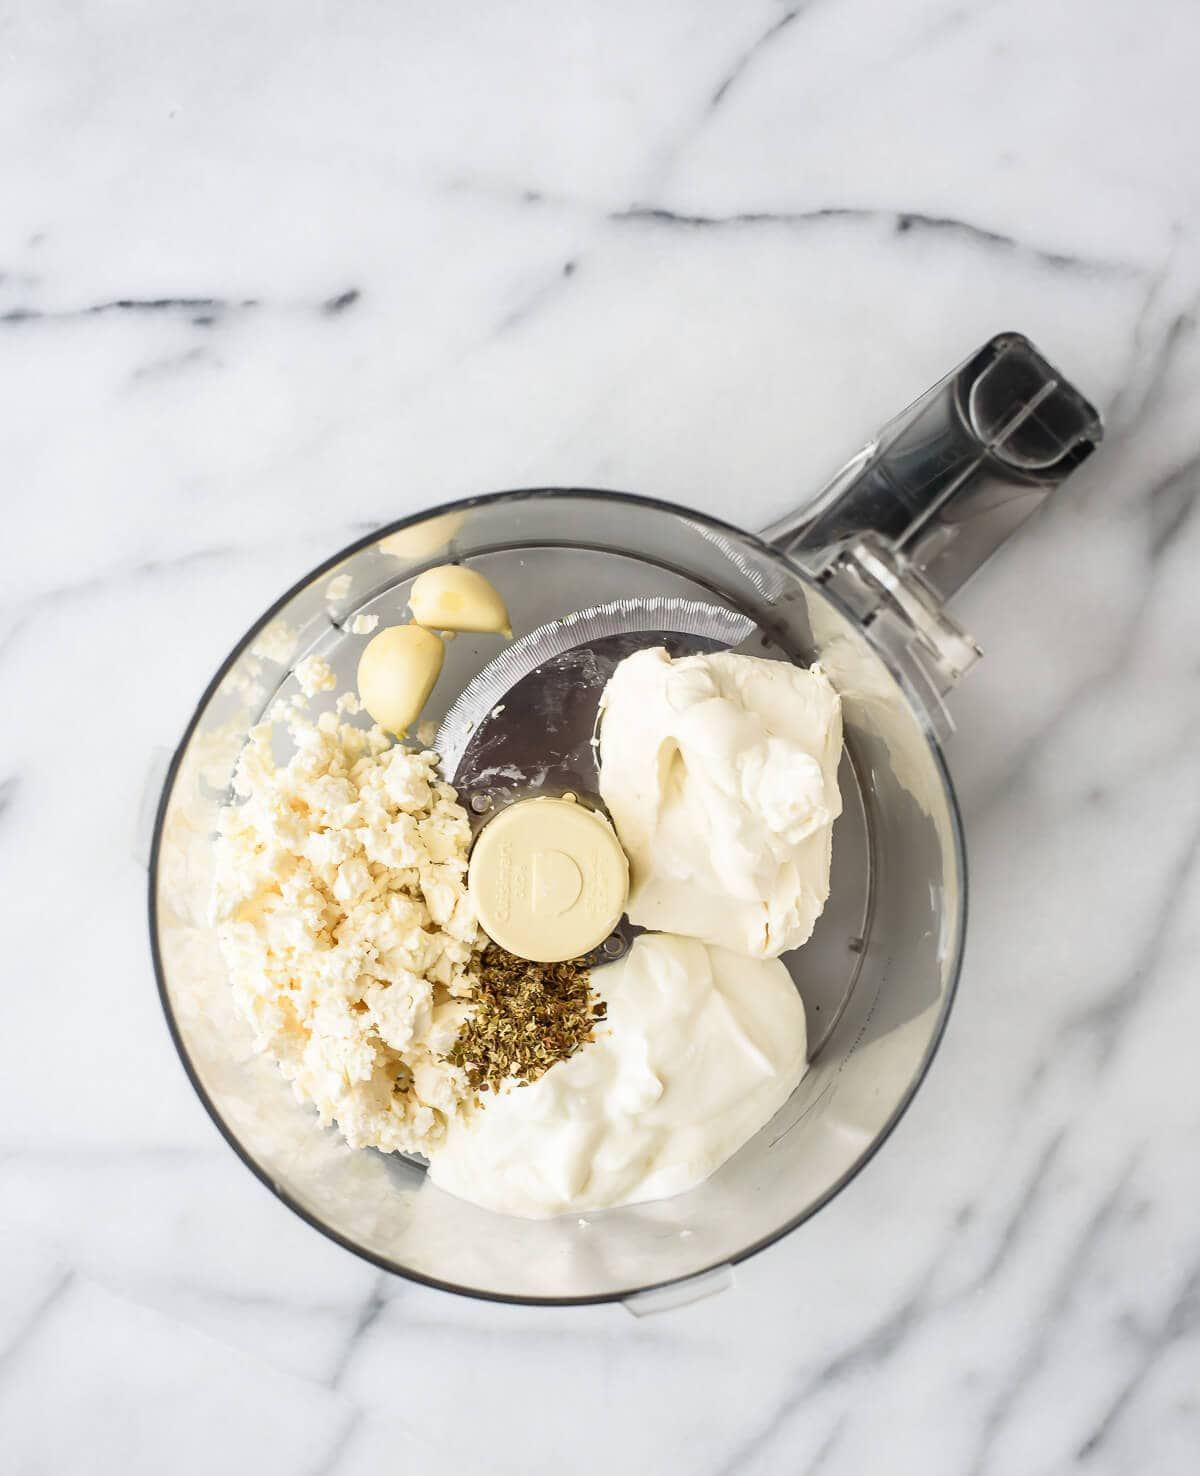 Skinny Garlic Feta Dip made with Greek yogurt. Easy and so delicious!